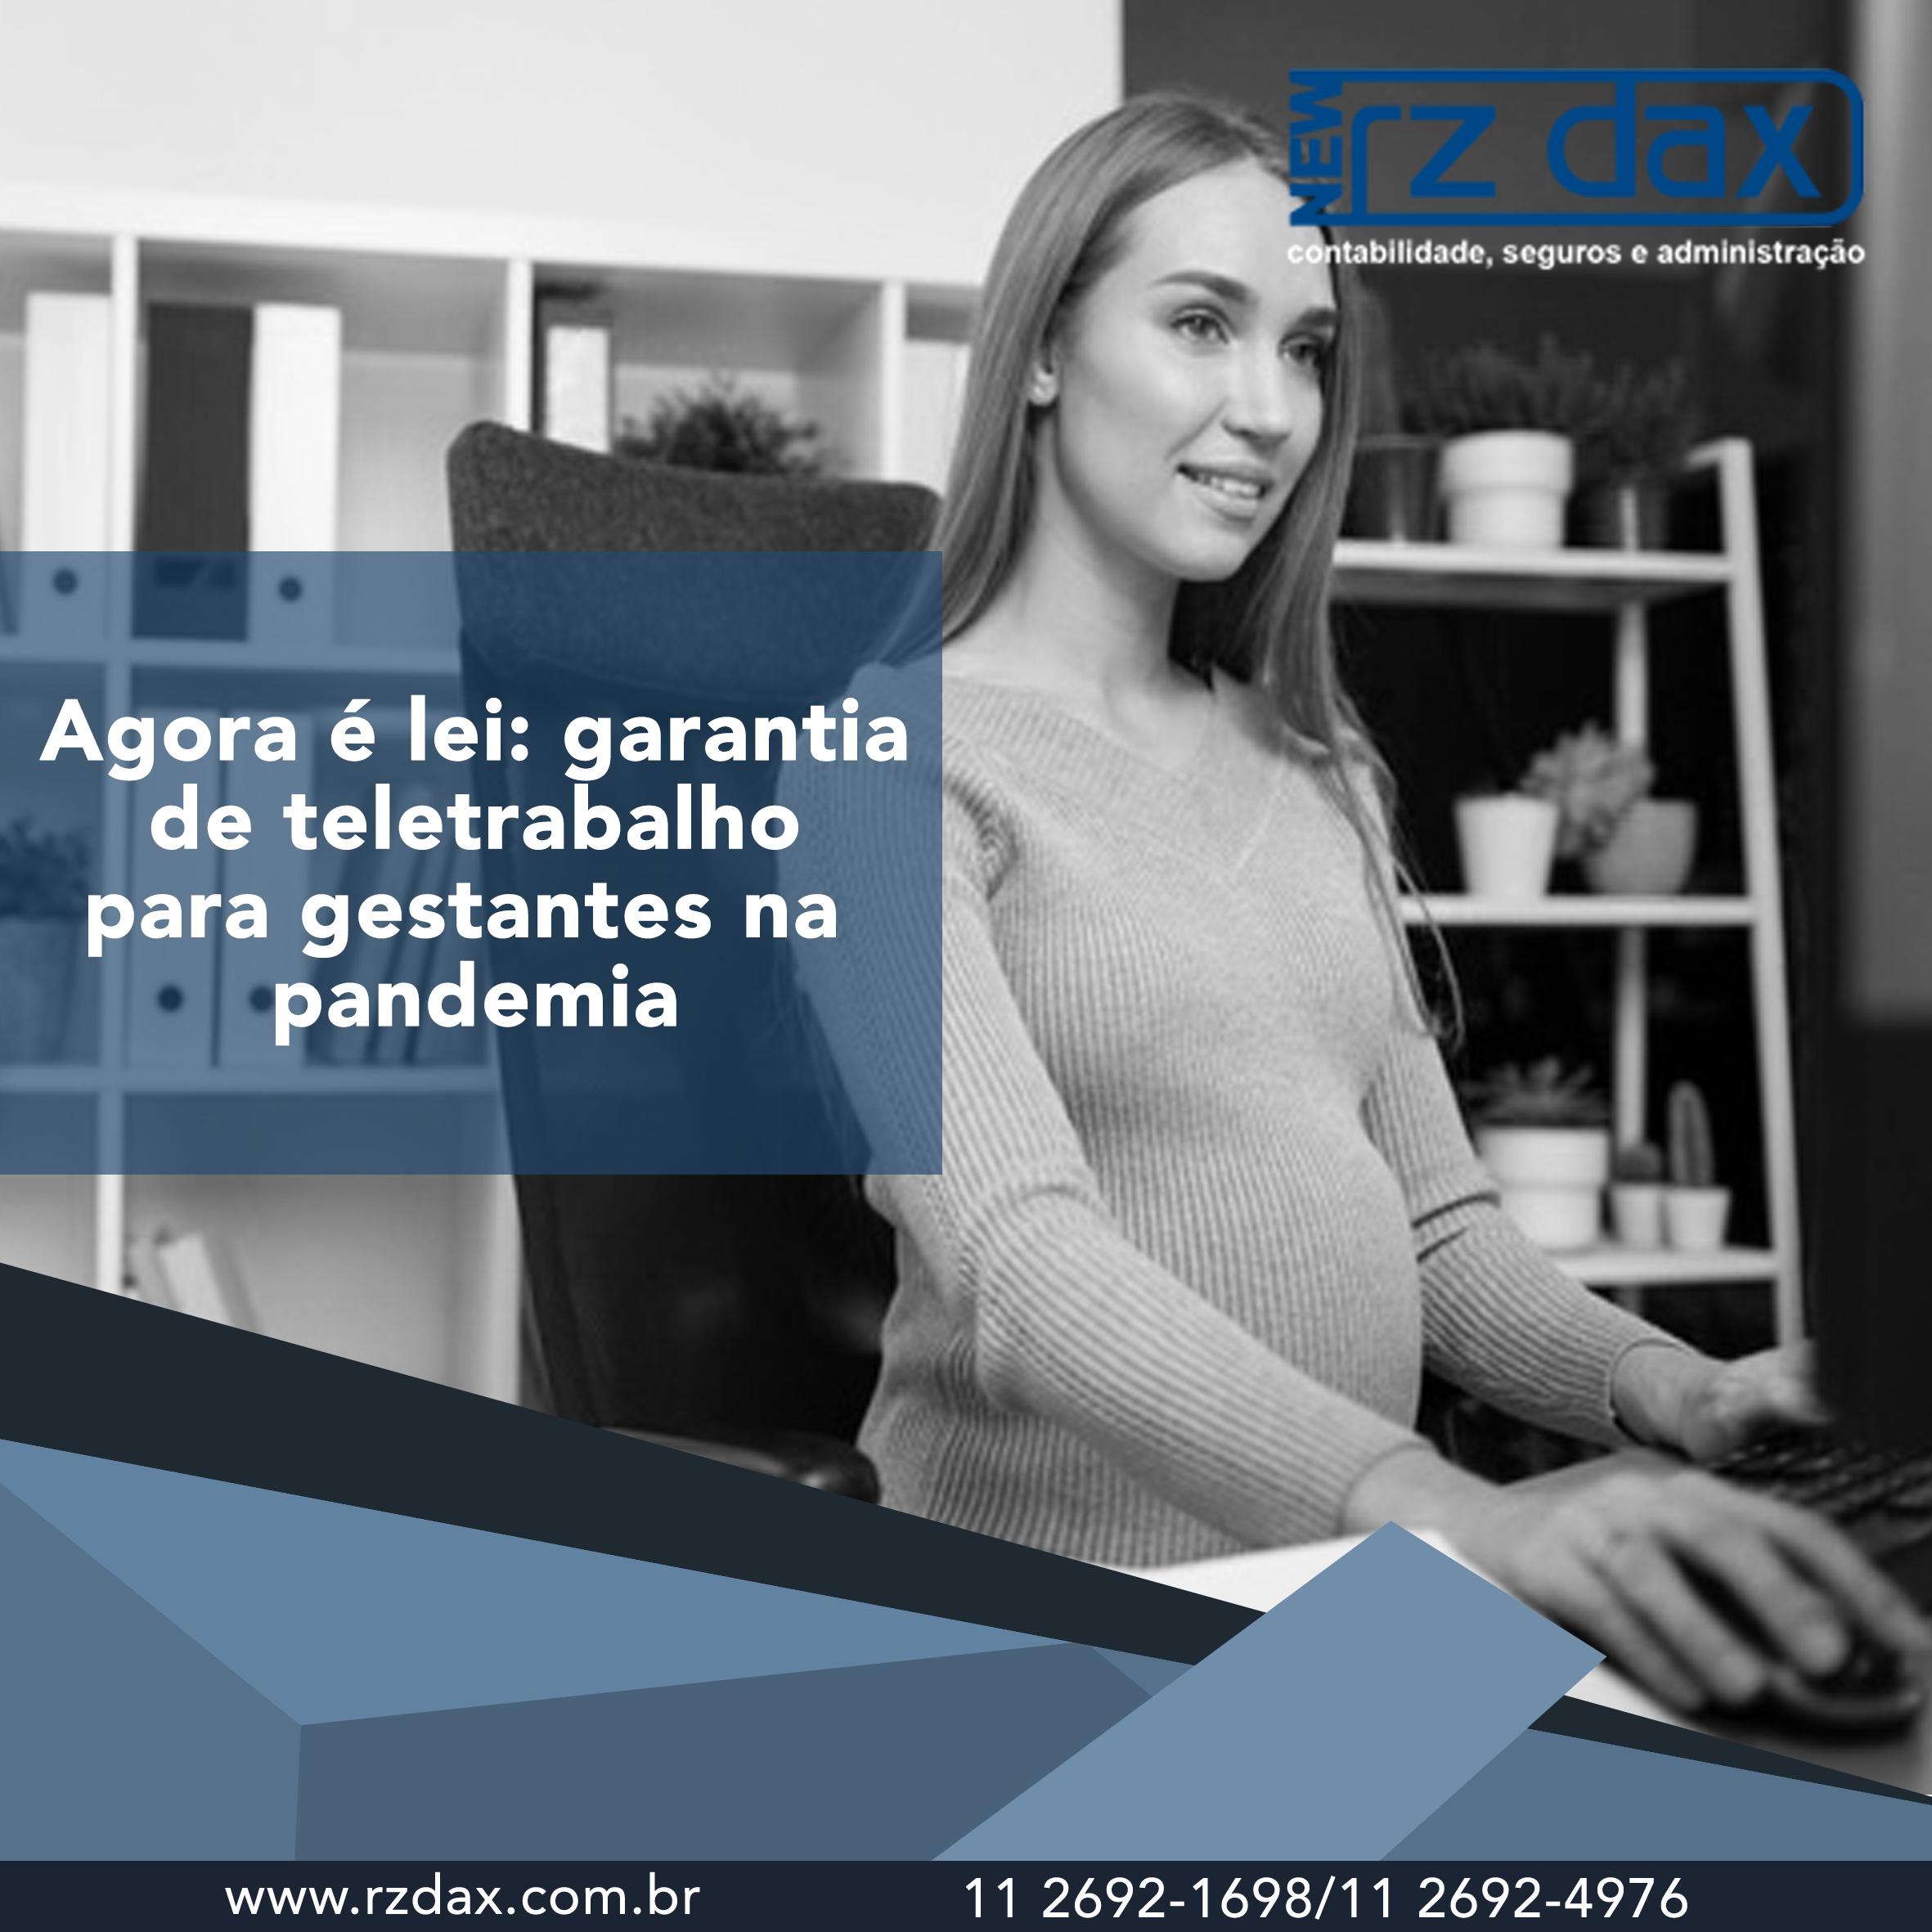 AGORA É LEI! GARANTIA DE TELETRABALHO PARA GESTANTES NA PANDEMIA